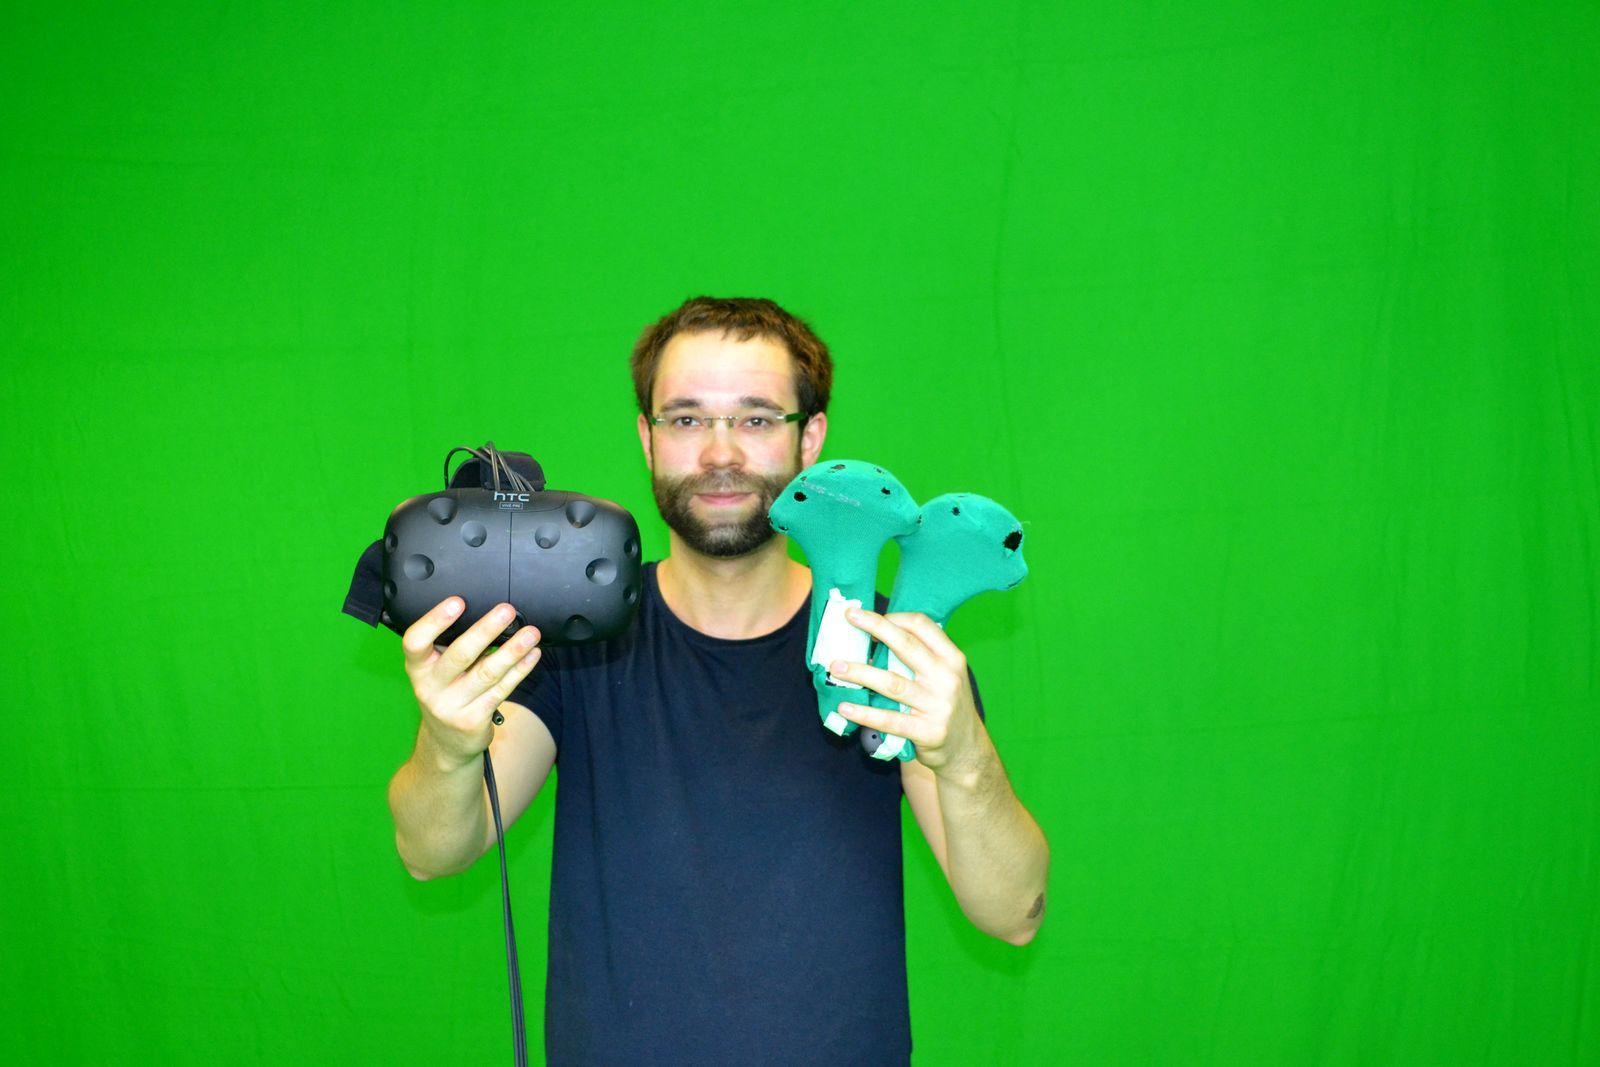 VR Greenscreen Markus